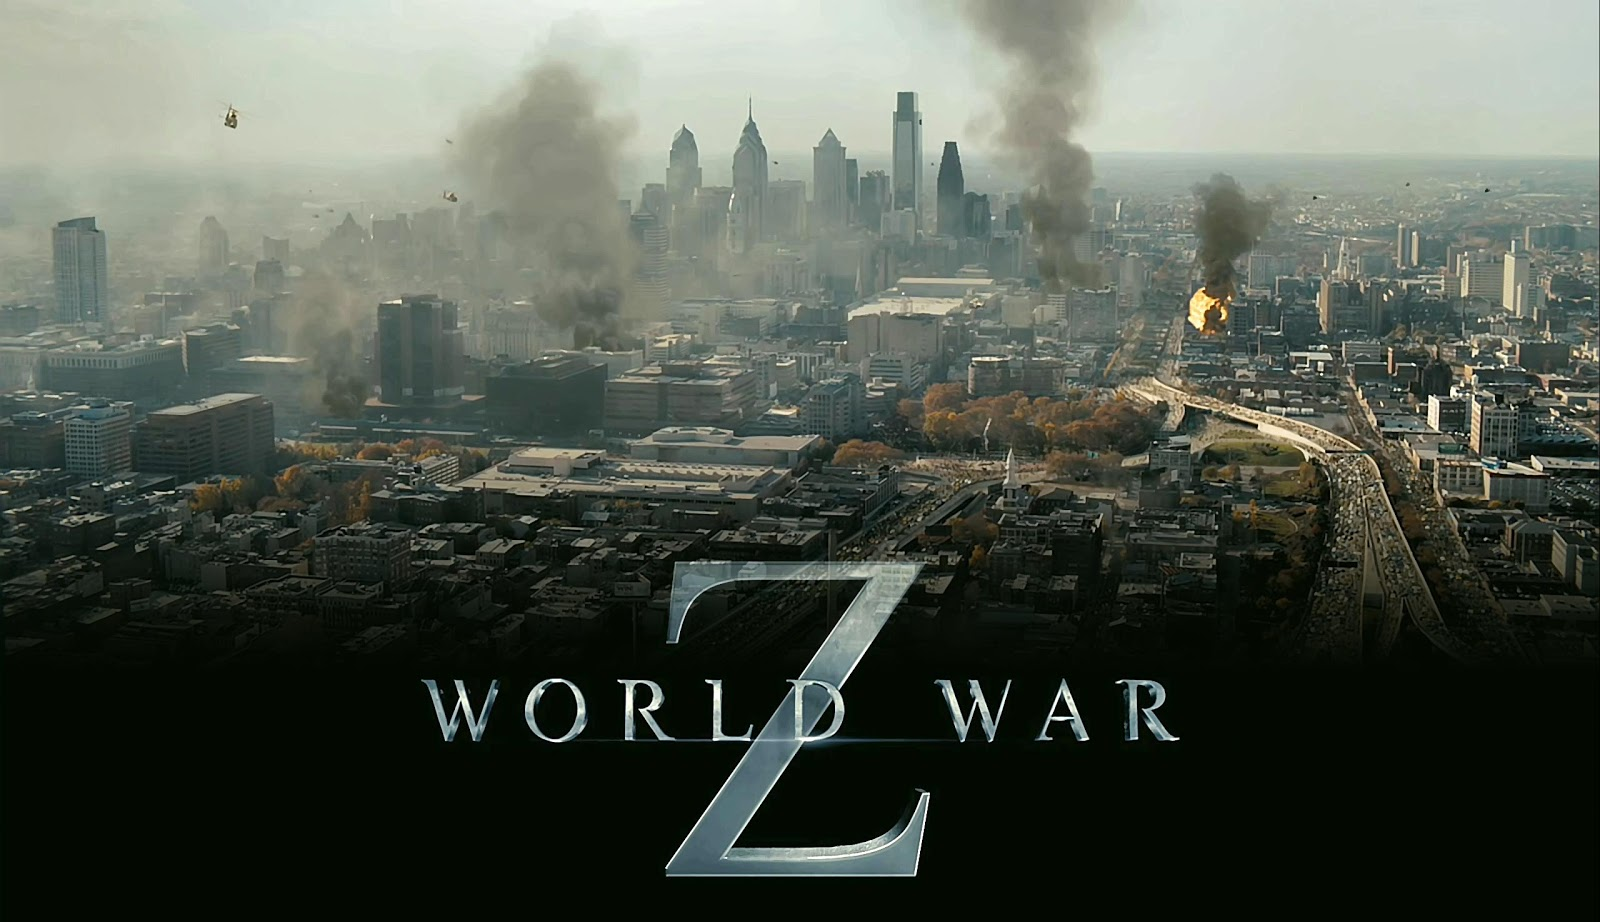 http://2.bp.blogspot.com/-cetJGqOpYM8/UMQAOSsgvaI/AAAAAAAAIZ4/sQ-Y5CYx0-Y/s1600/world-war-z1.jpg